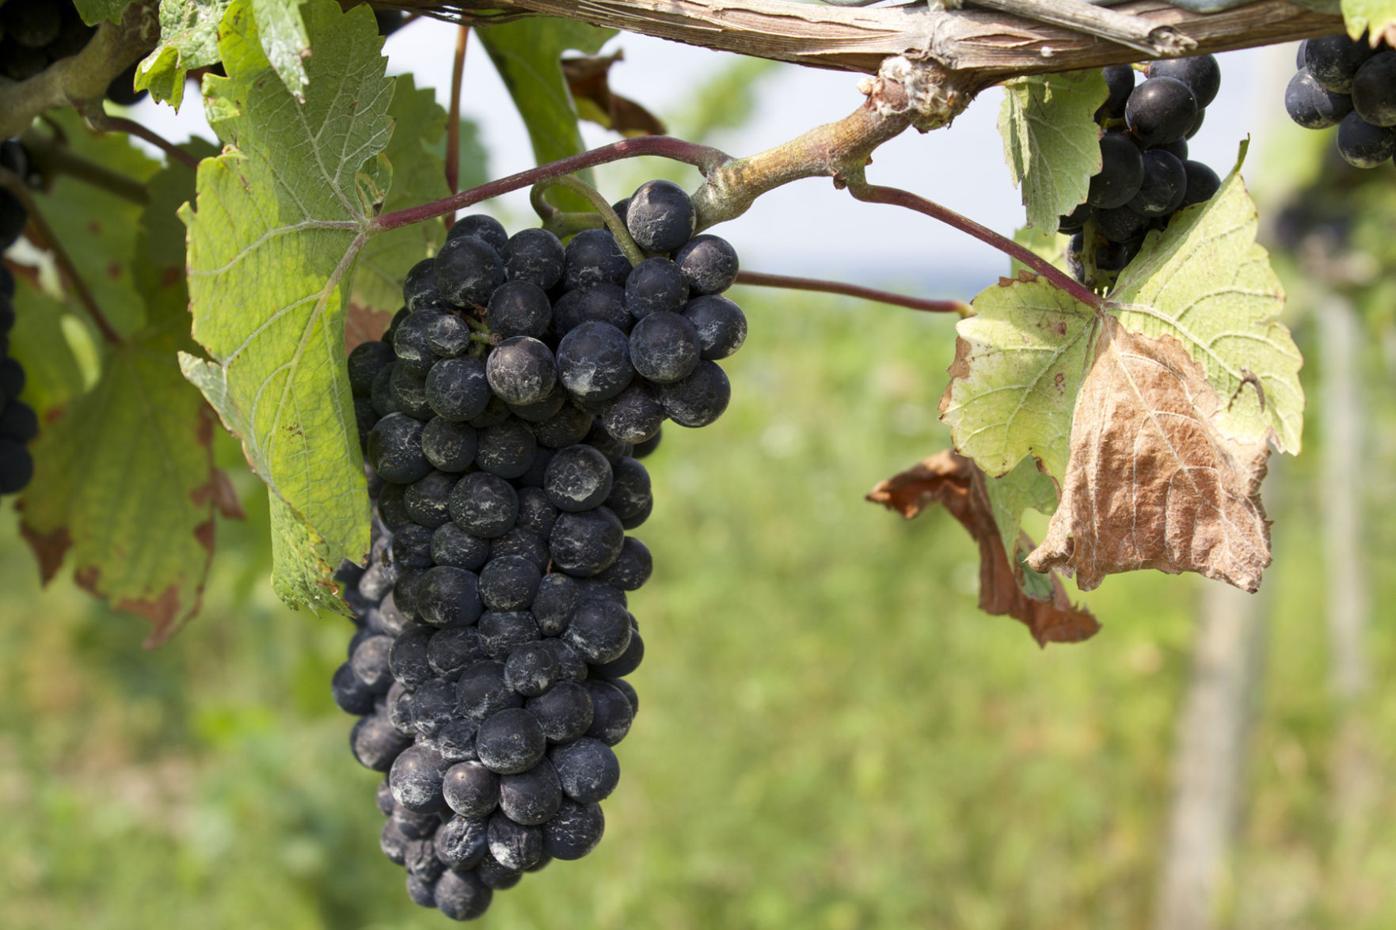 The birth of wine